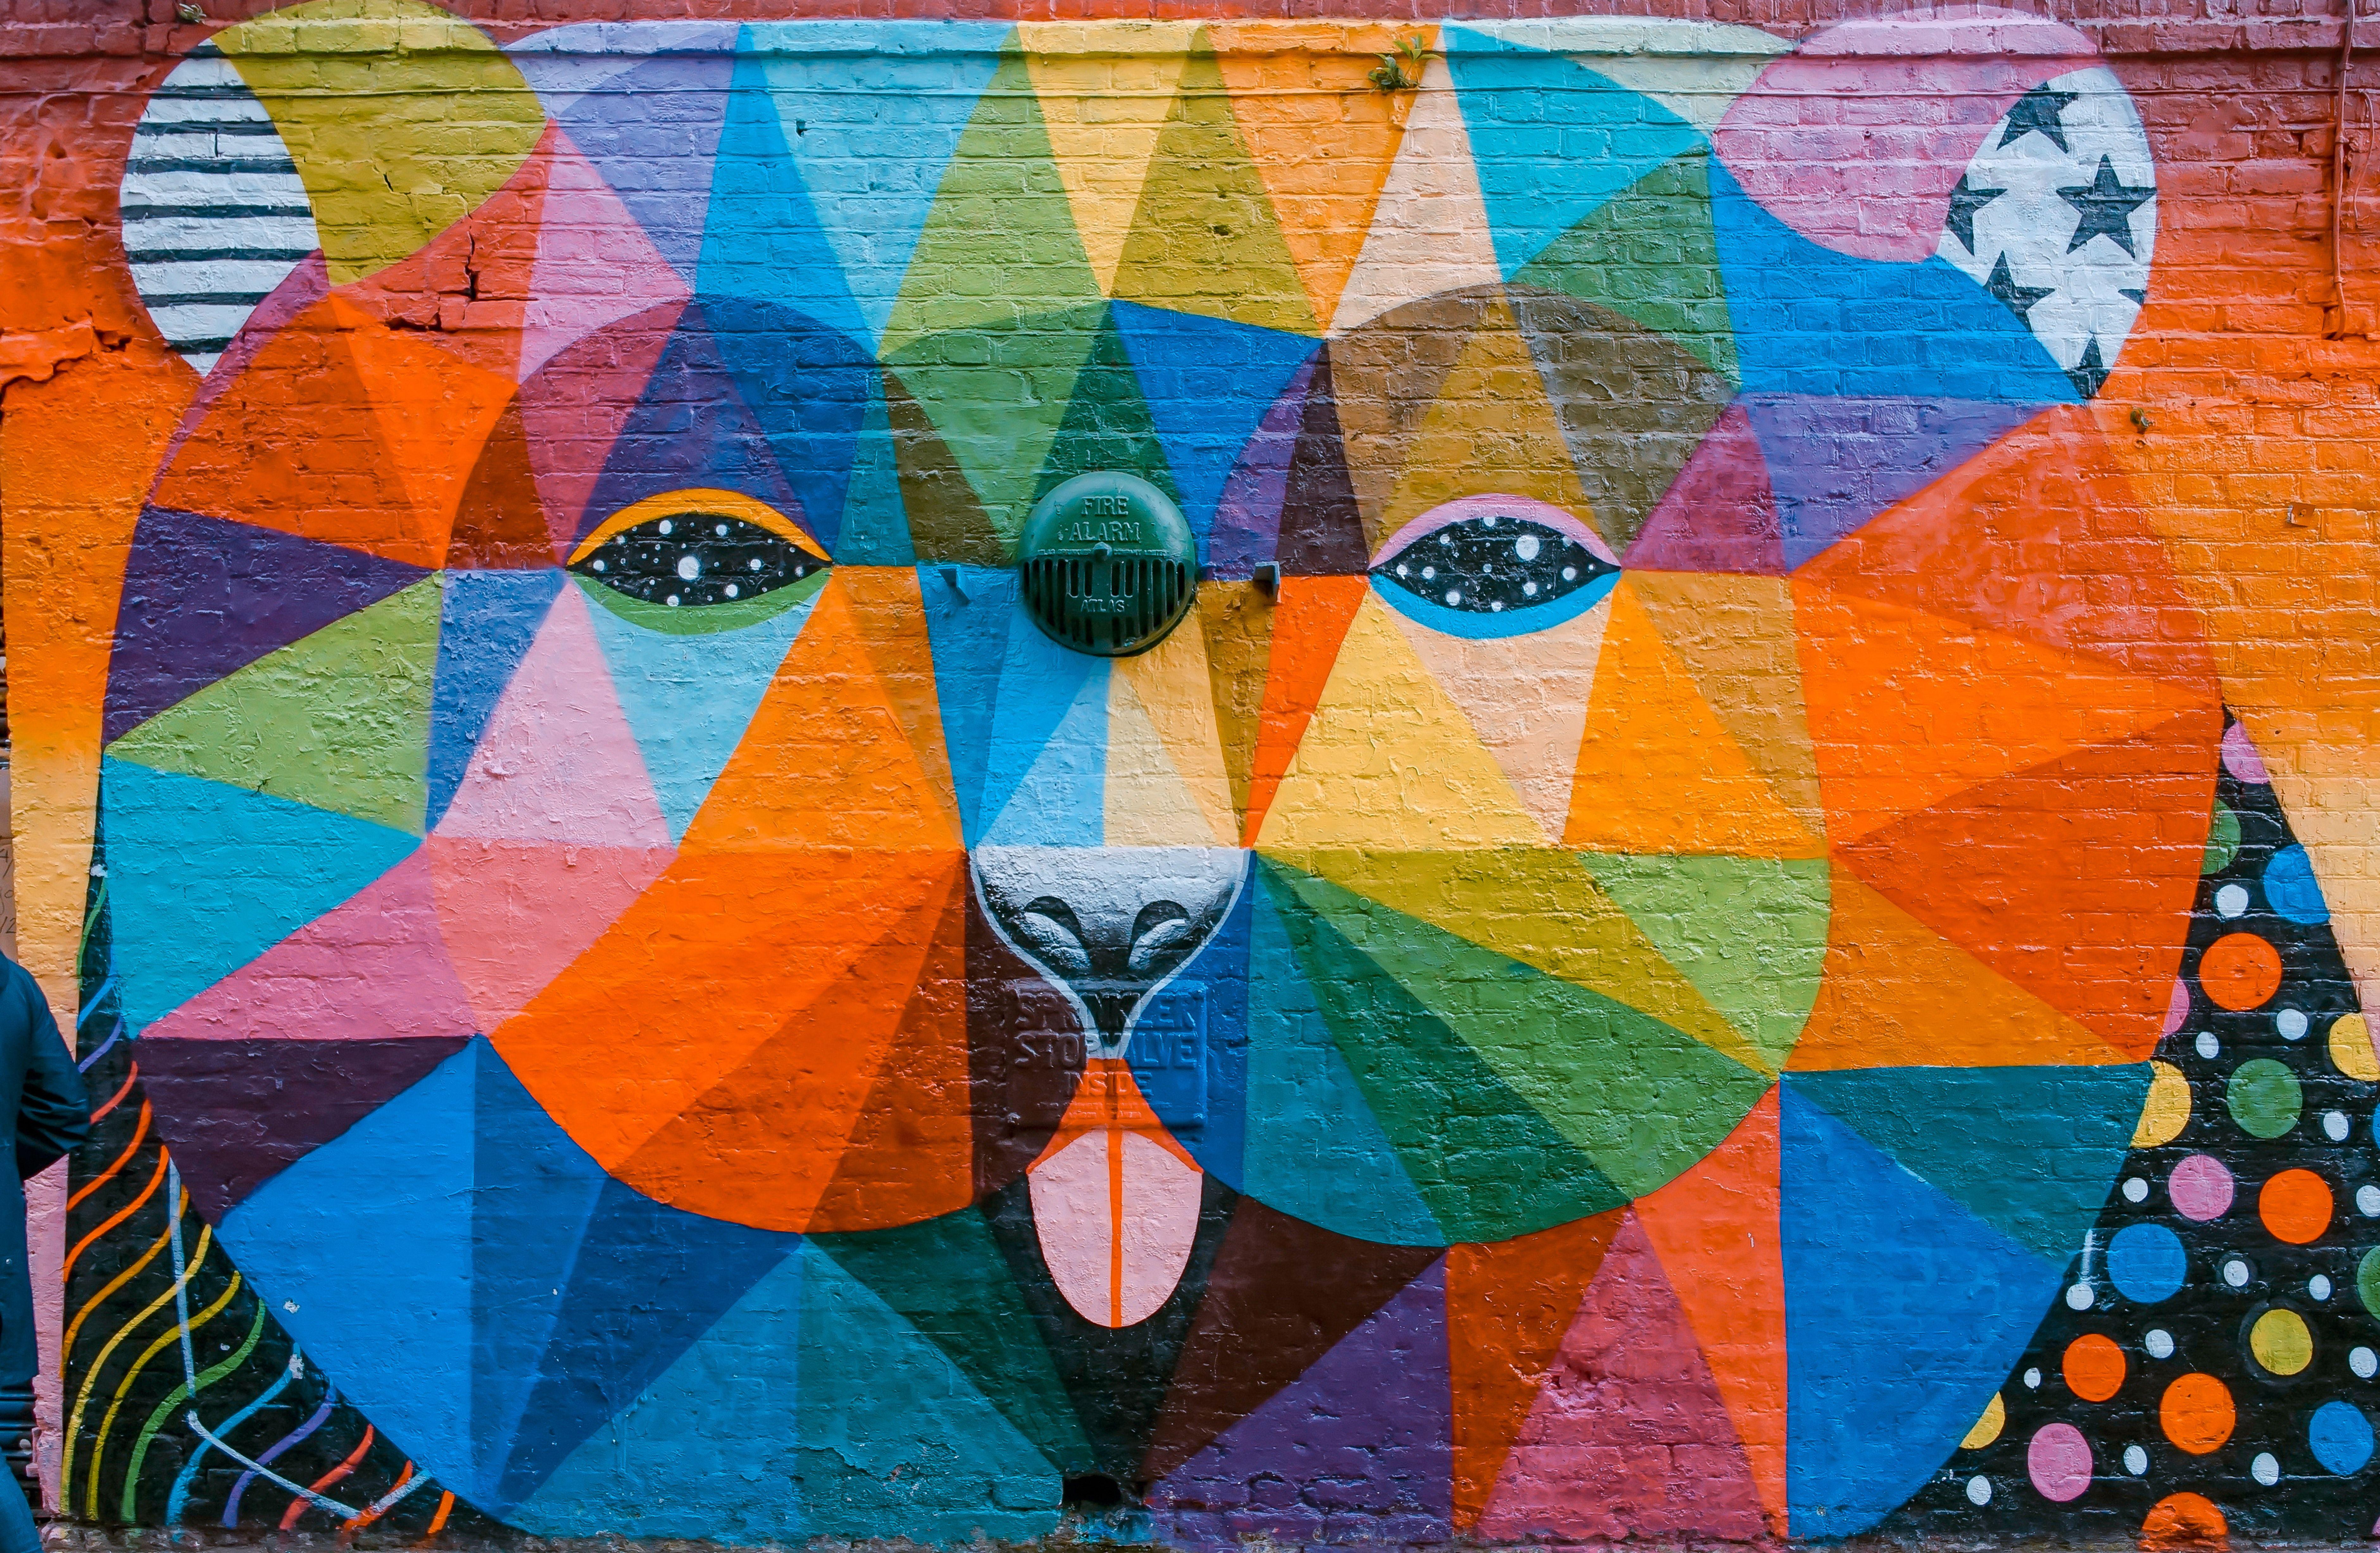 """Oso"" by Okuda San Miguel Mural Bear photo by Toa Heftiba"